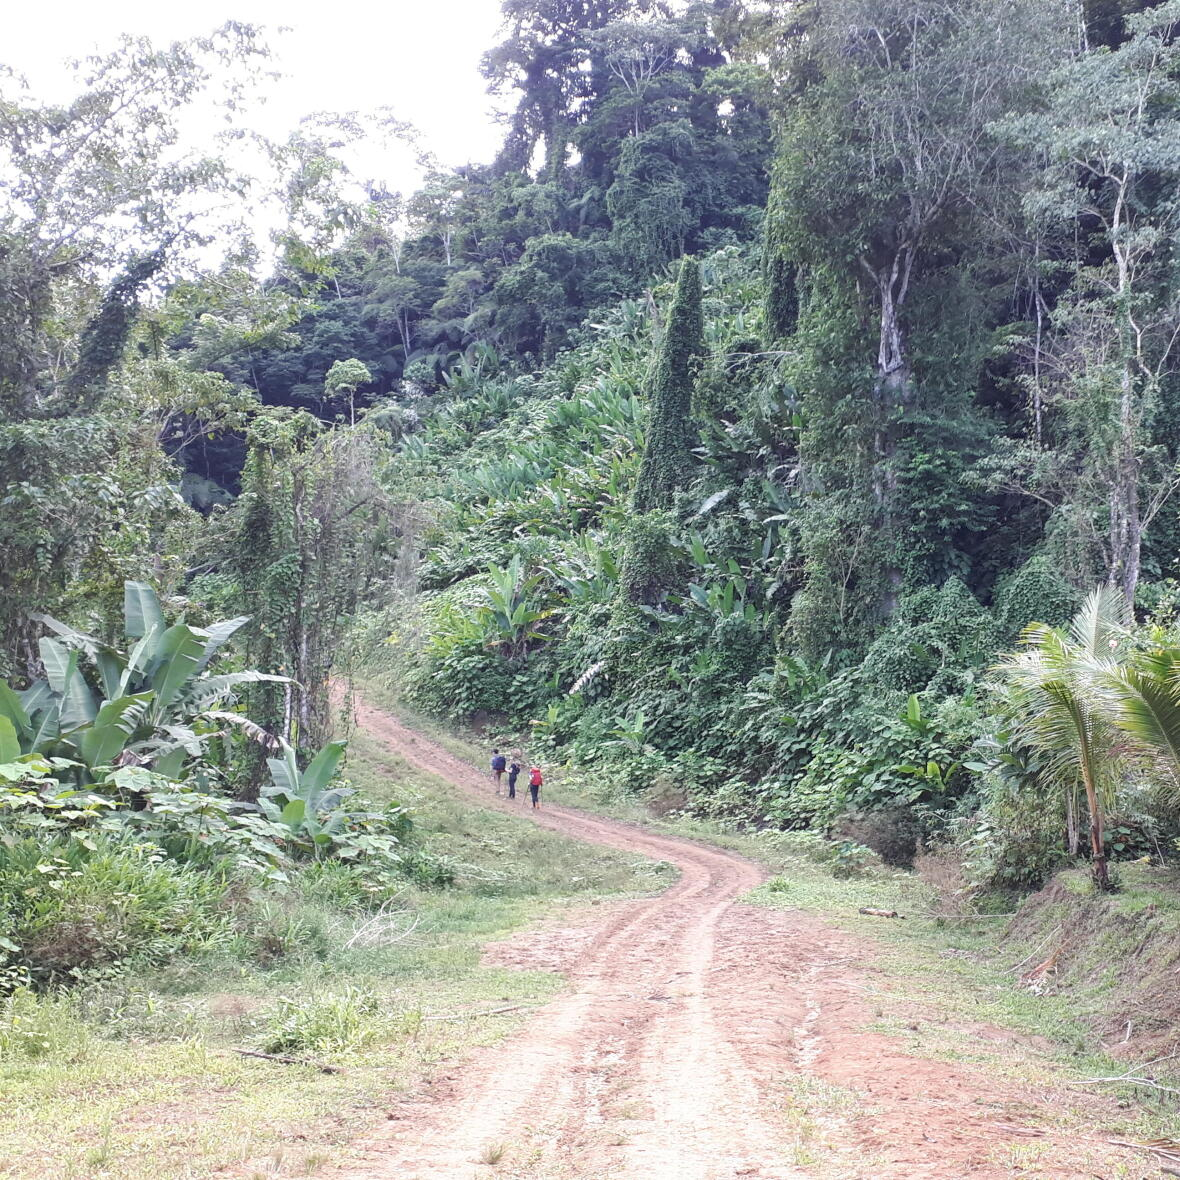 rando dans la boue de la jungle du costa rica